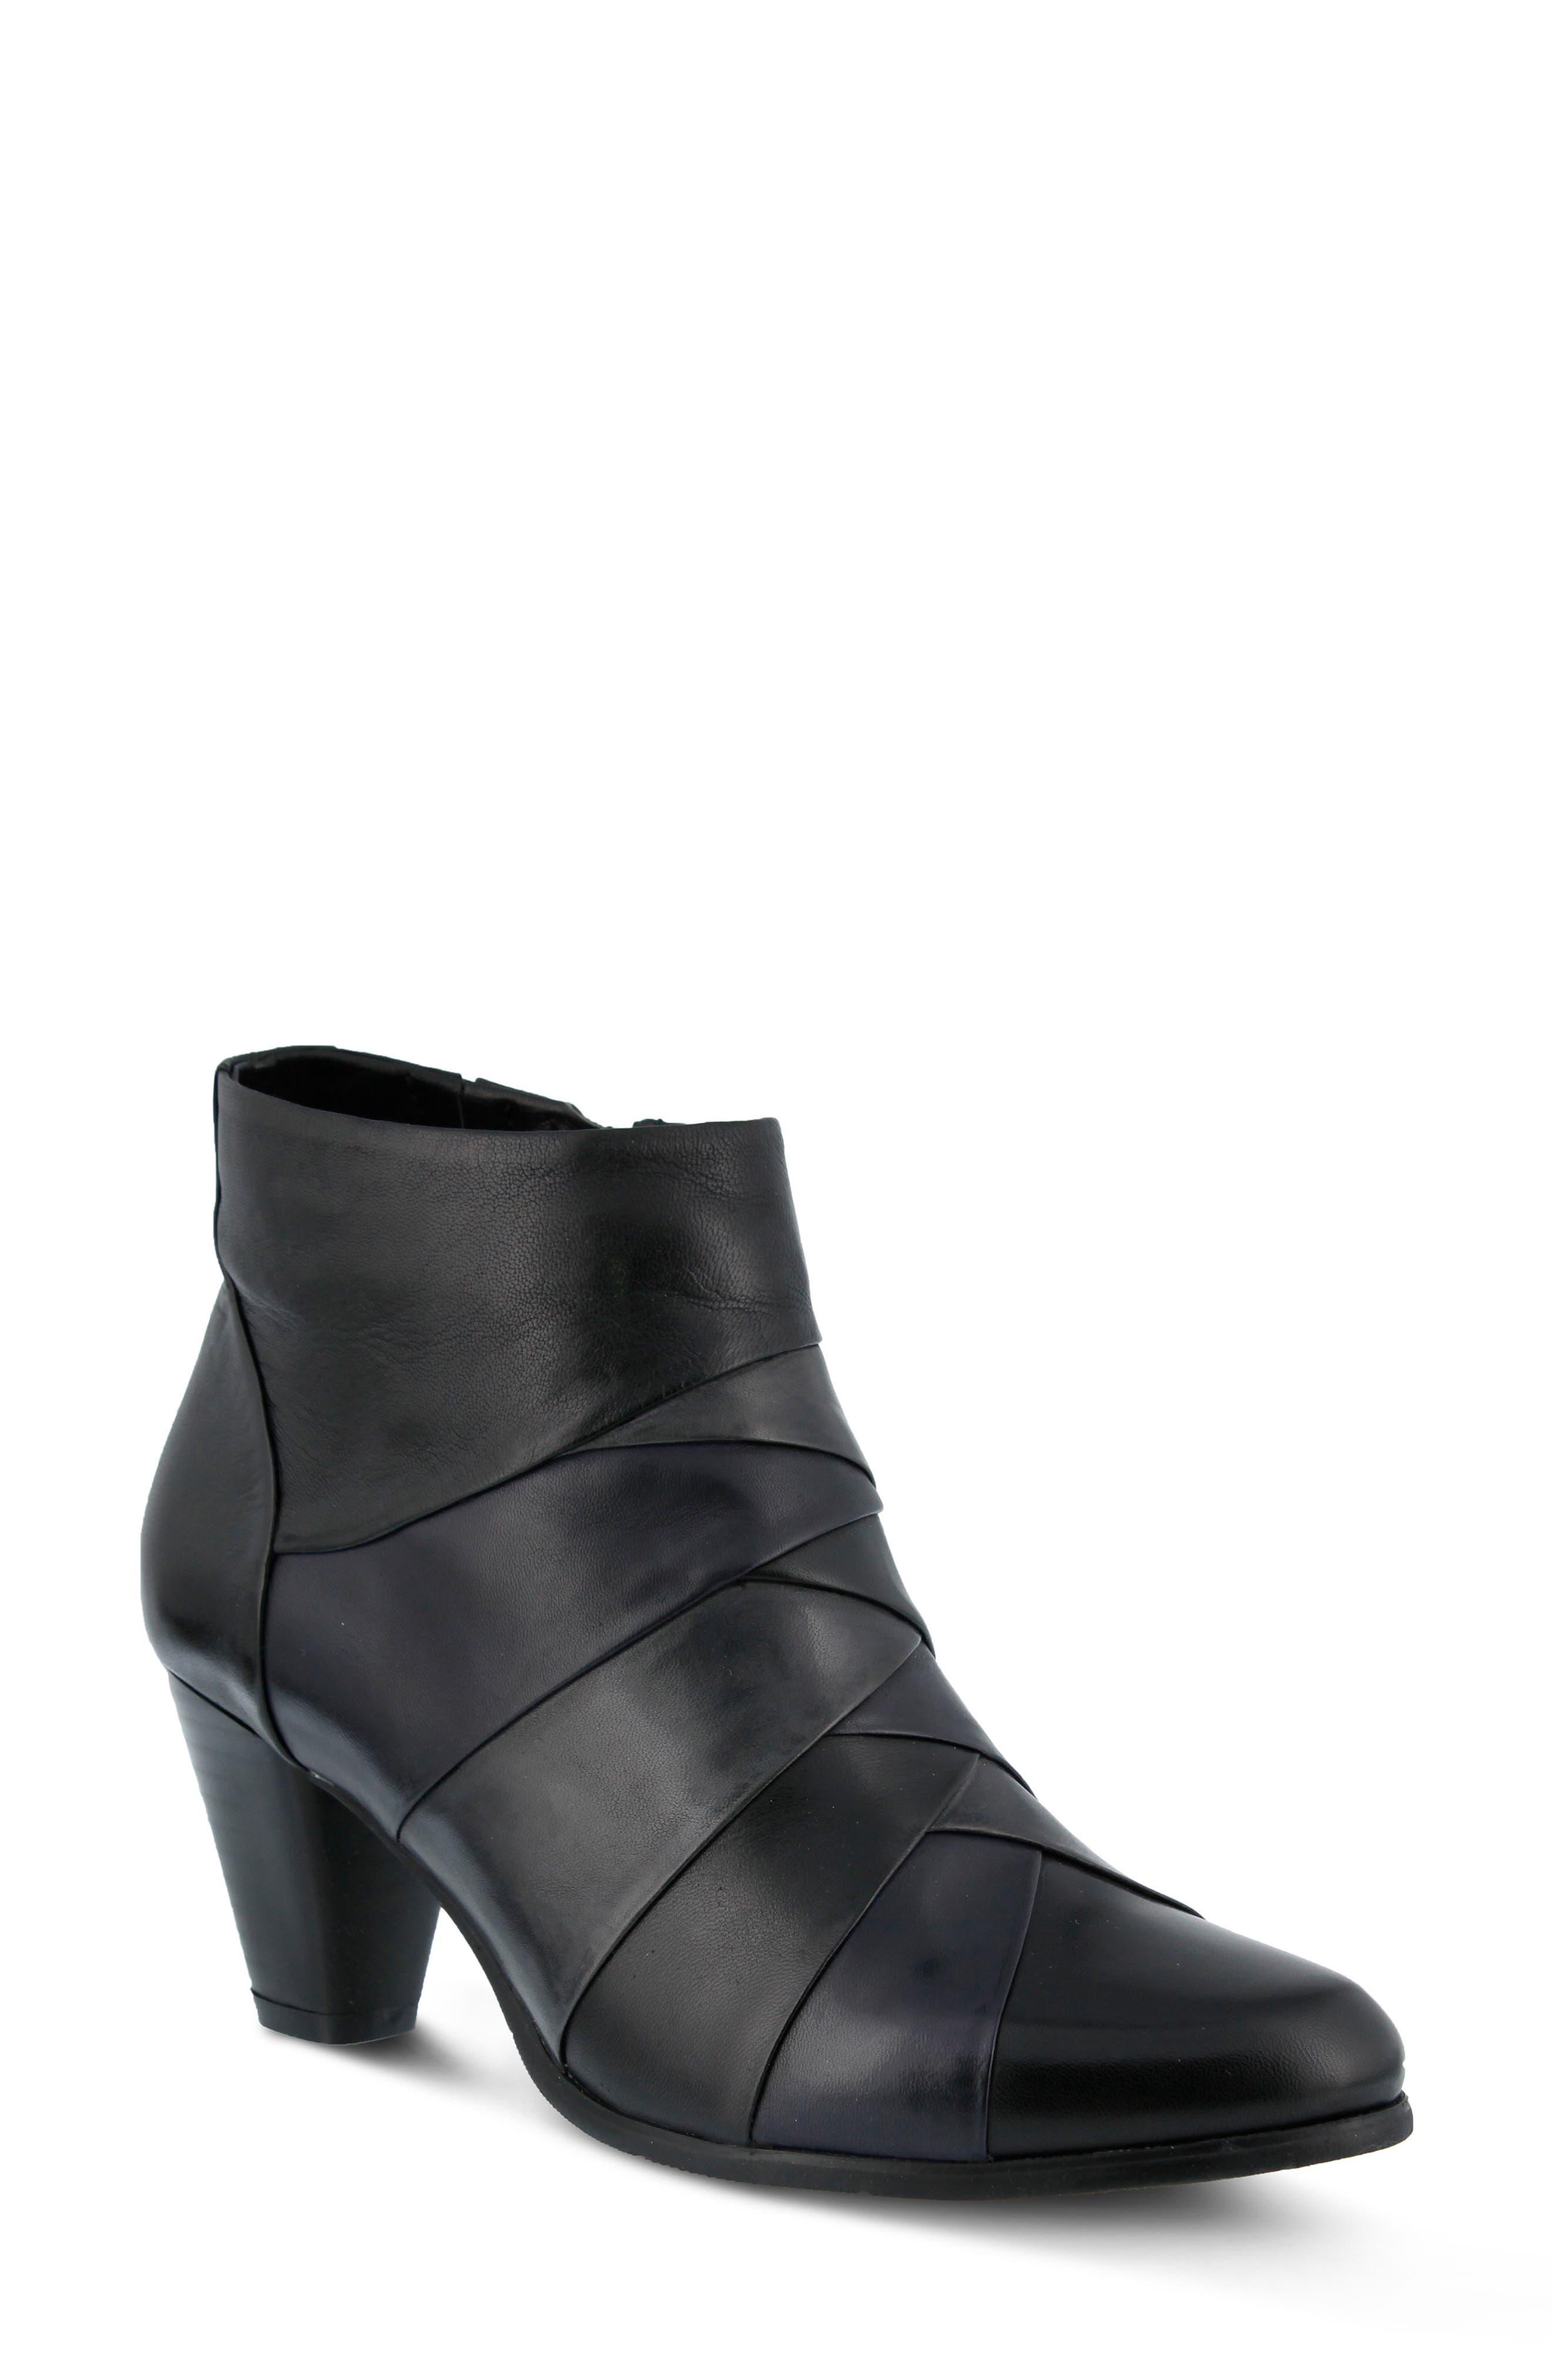 Binzo Bootie,                         Main,                         color, Black Multi Leather